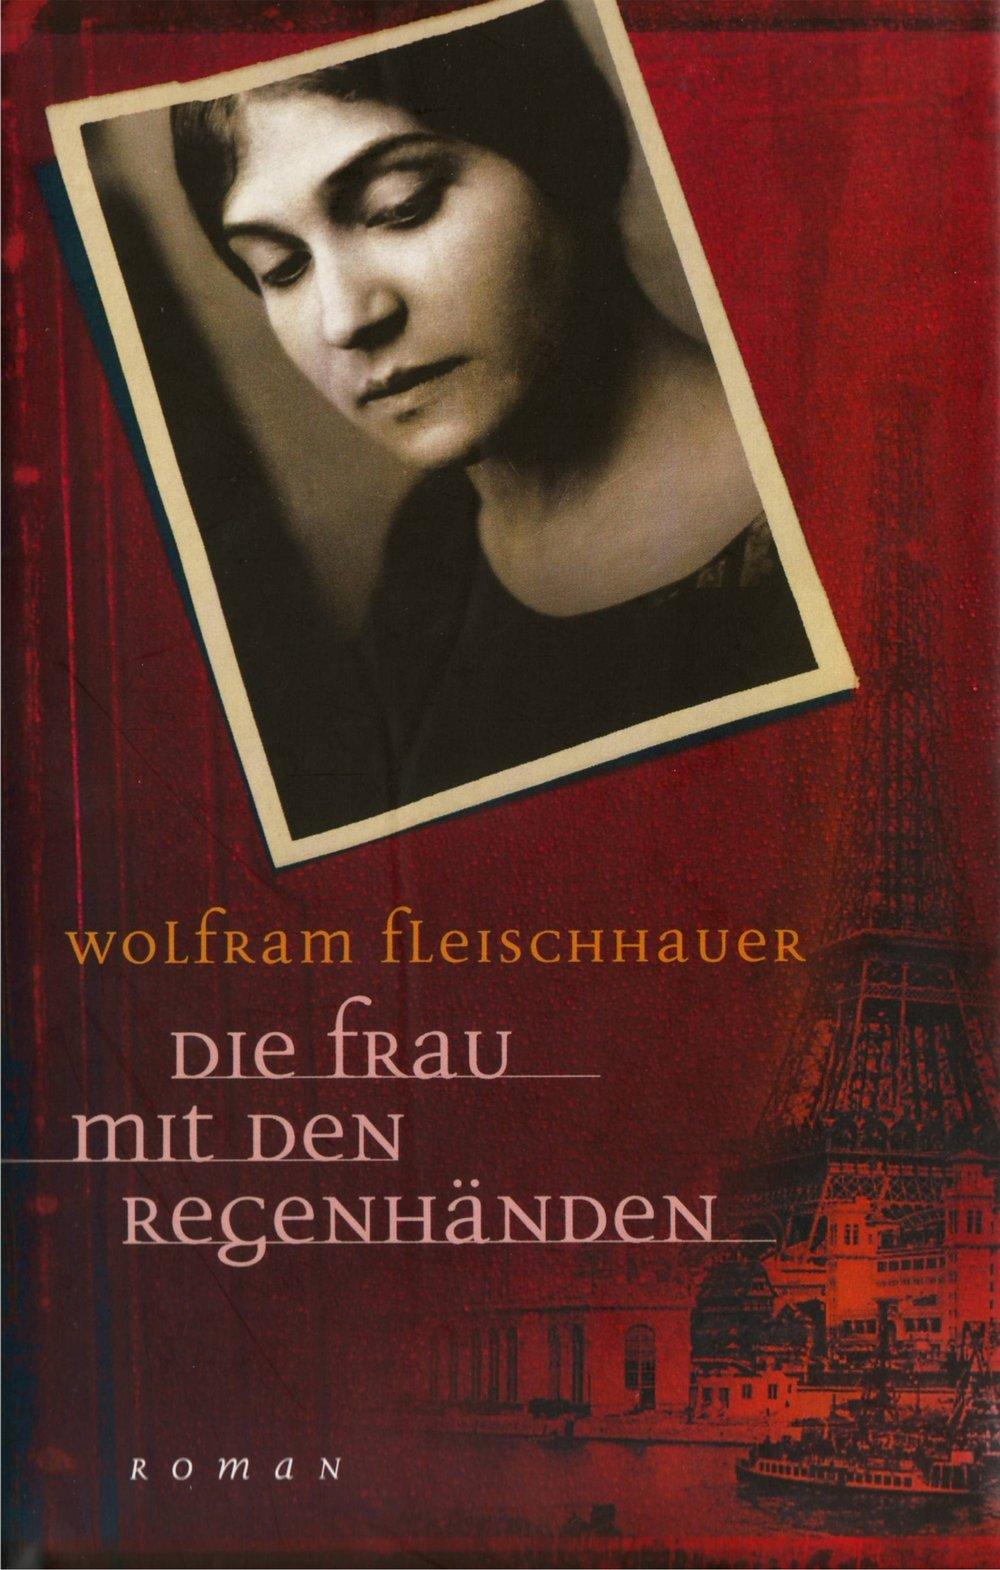 Regenhände D Club Bertelsmann.jpg